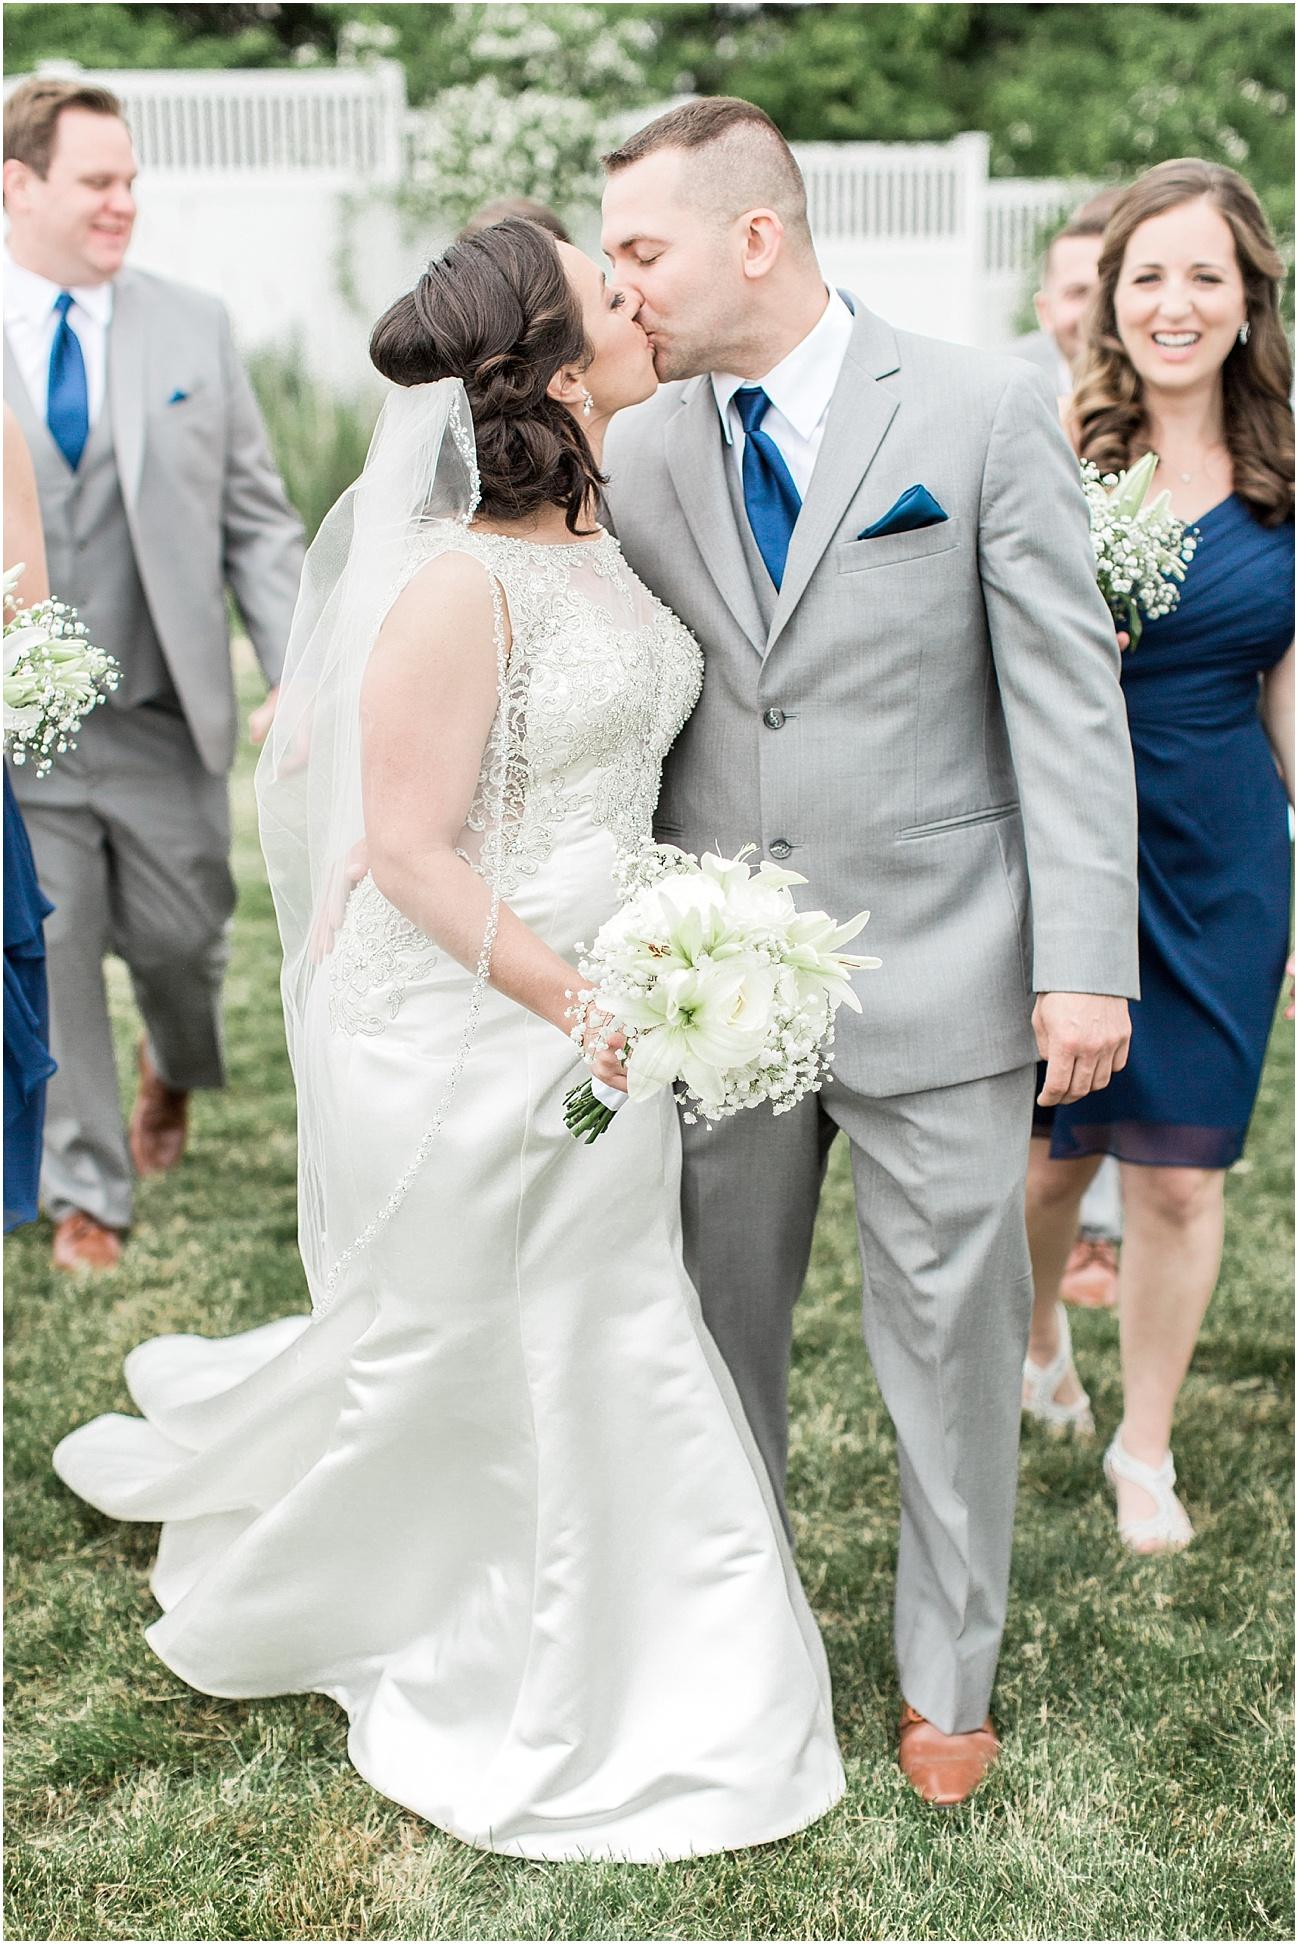 nicole_stephen_cape_club_nicky_falmouth_cod_boston_wedding_photographer_meredith_jane_photography_photo_0186.jpg